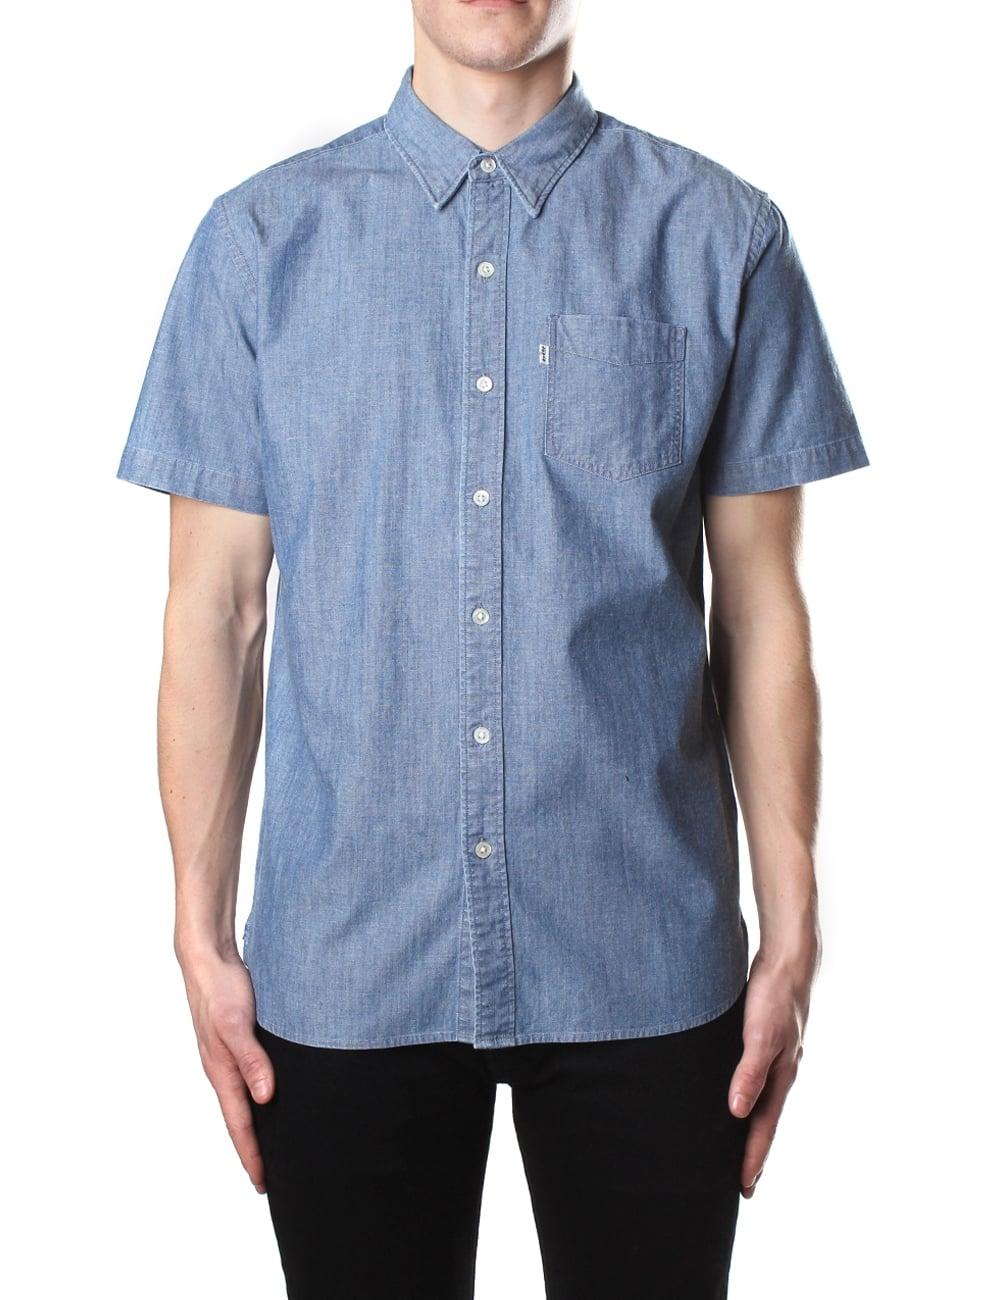 b2f721c6e Levi's Short Sleeve Sunset Men's One Pocket Shirt